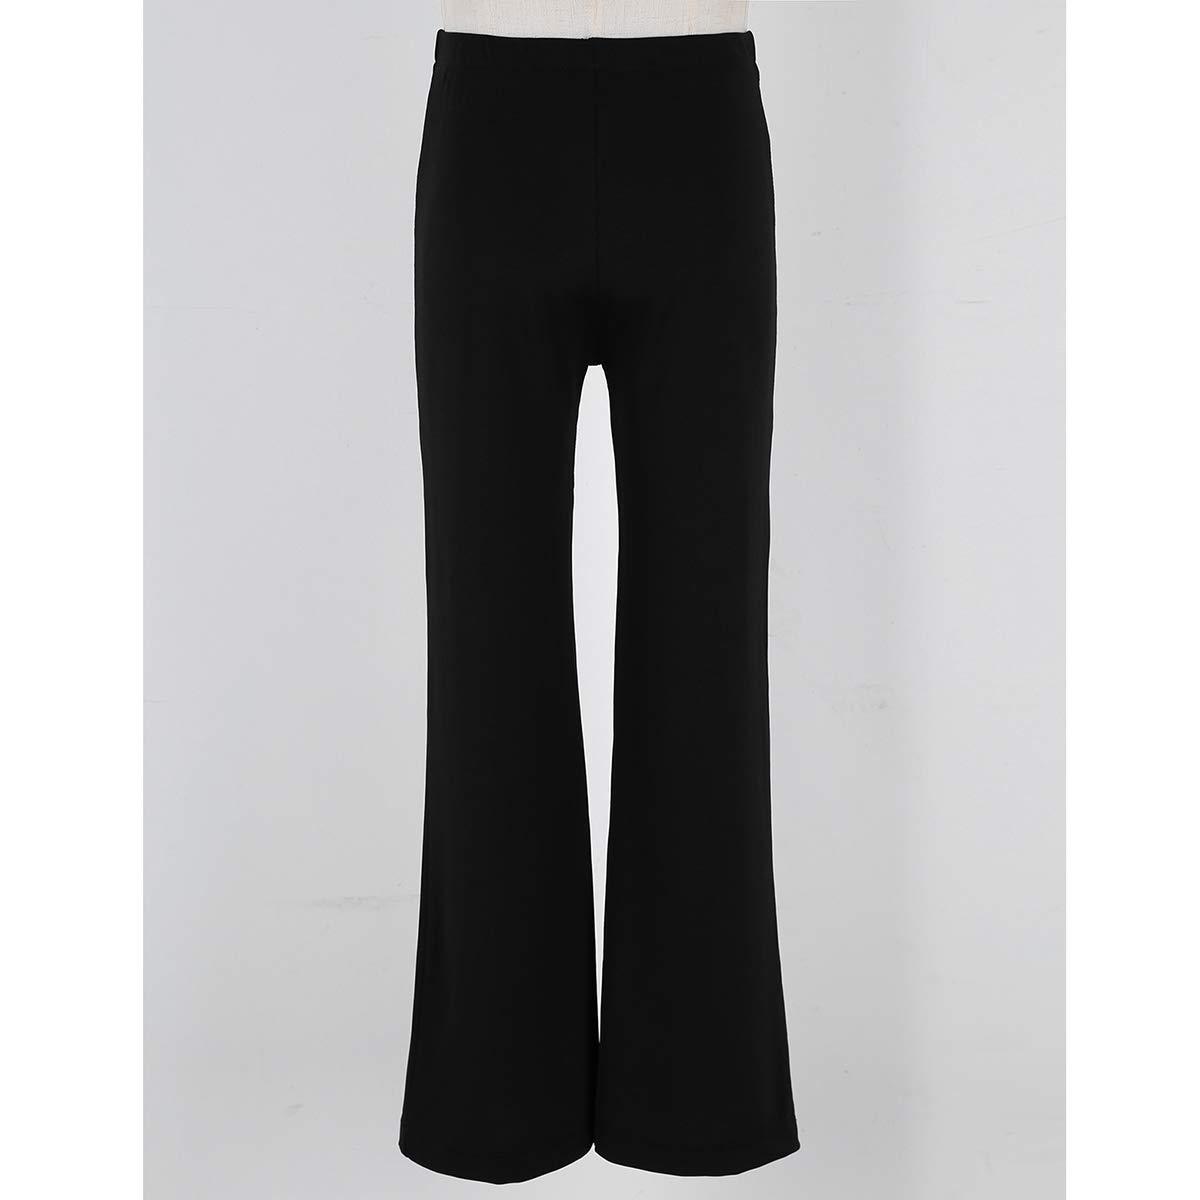 zdhoor Kids Girls Boys Jazz Dance Pants Loose Fit Elastic Waist Stretchy Dancewear Classic Gymnastic Costumes